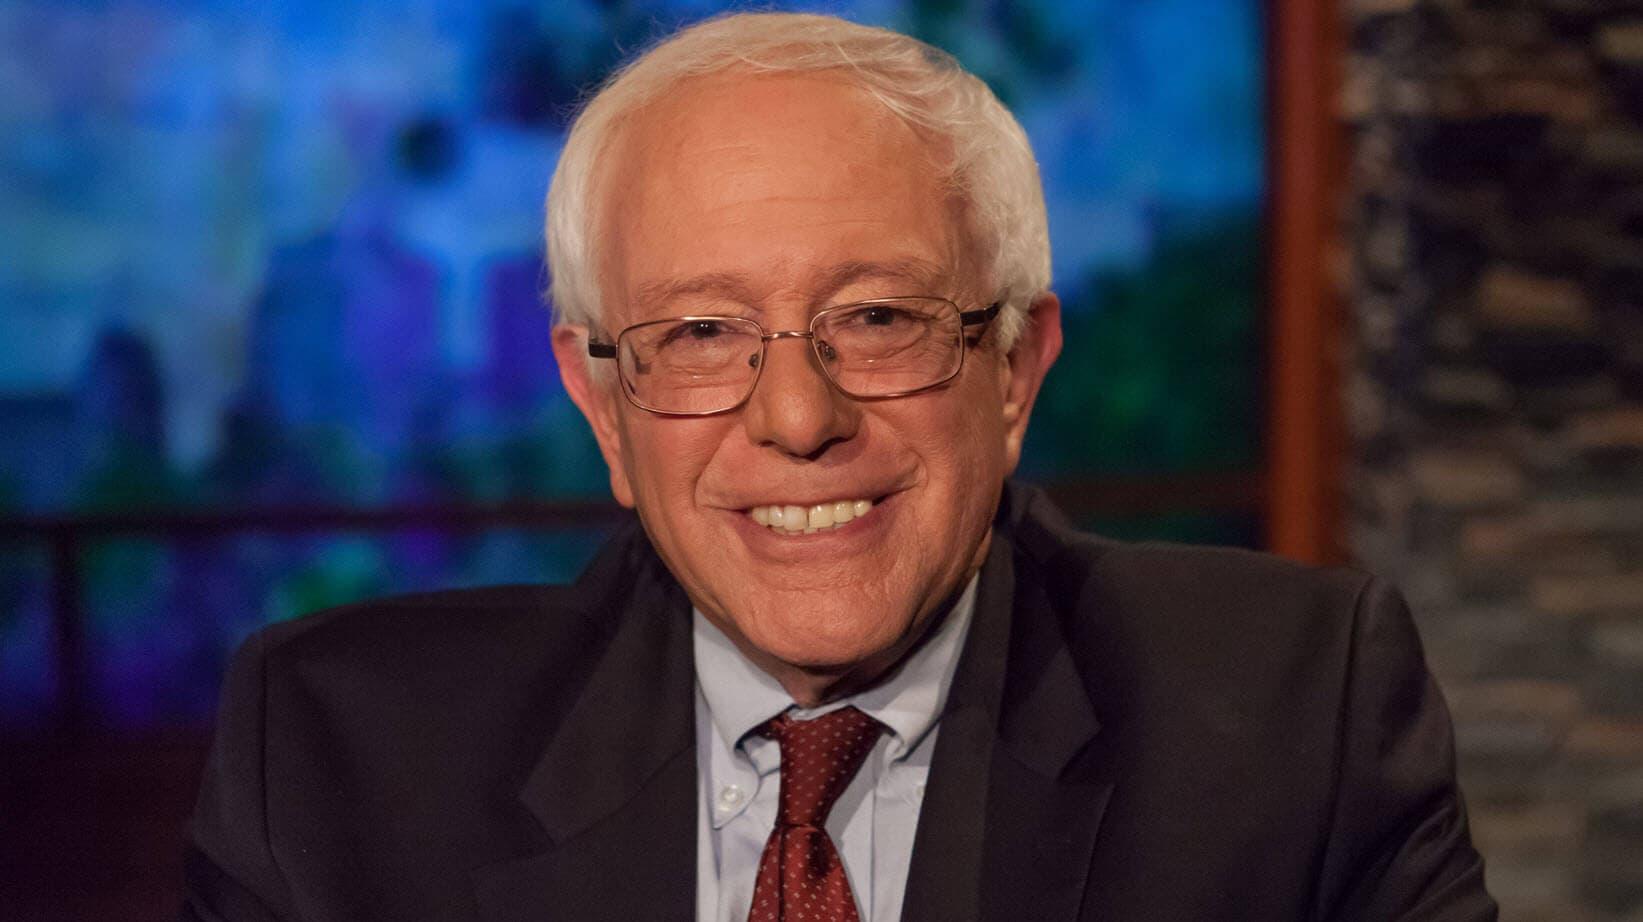 Senator Sanders Speaks Out For Renewable Energy Industry